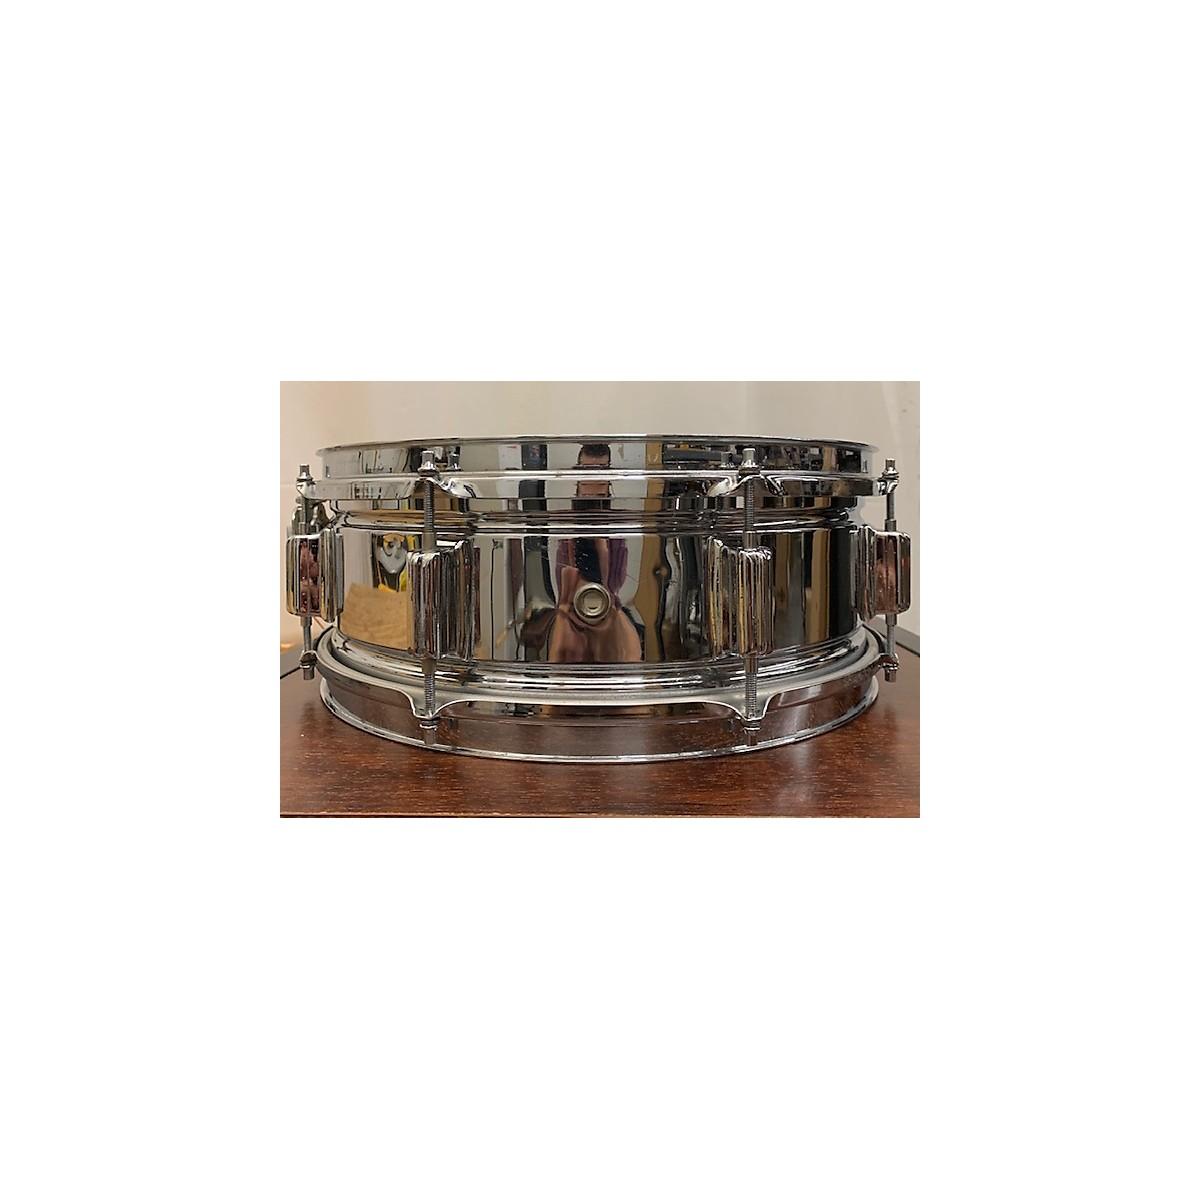 Rogers 1960s 14X5  Powertone Snare Drum